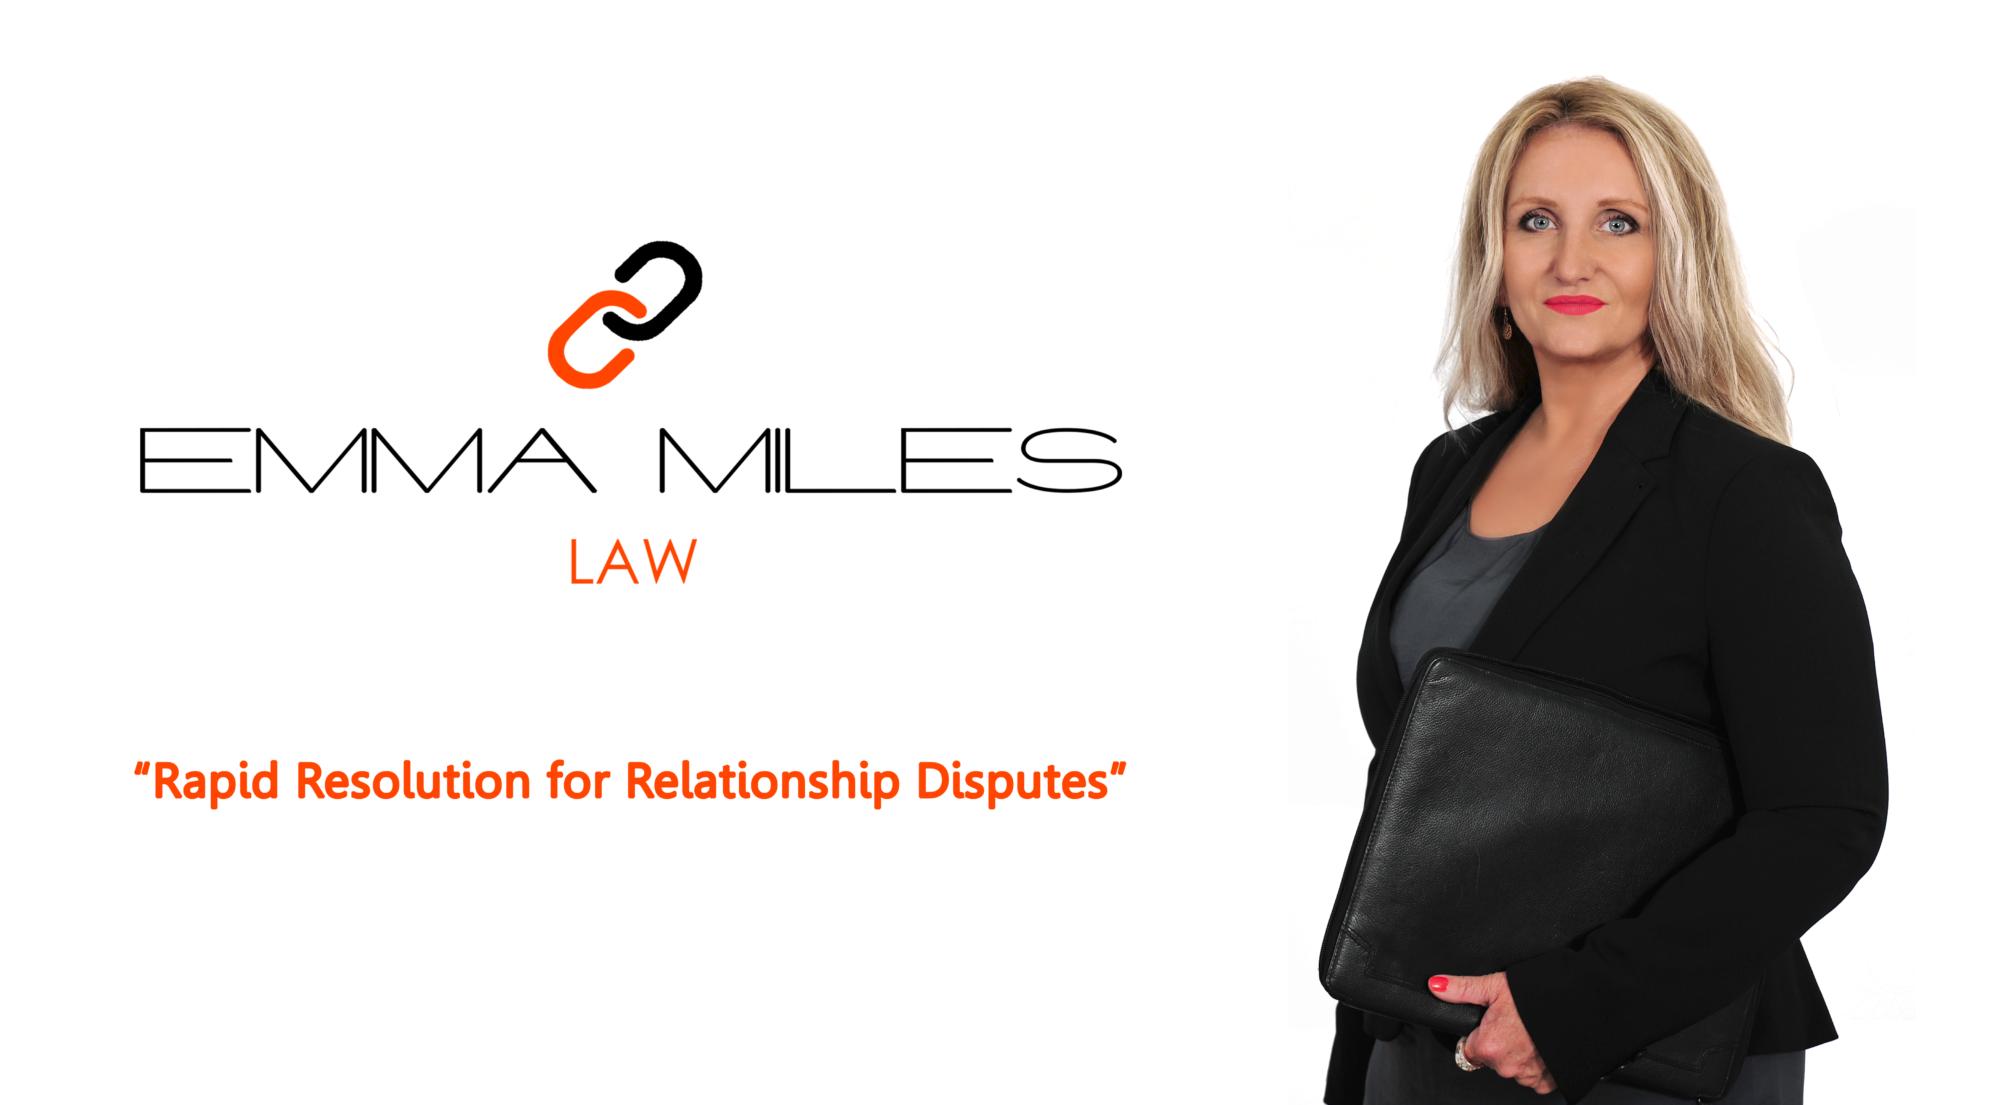 Emma Miles Law